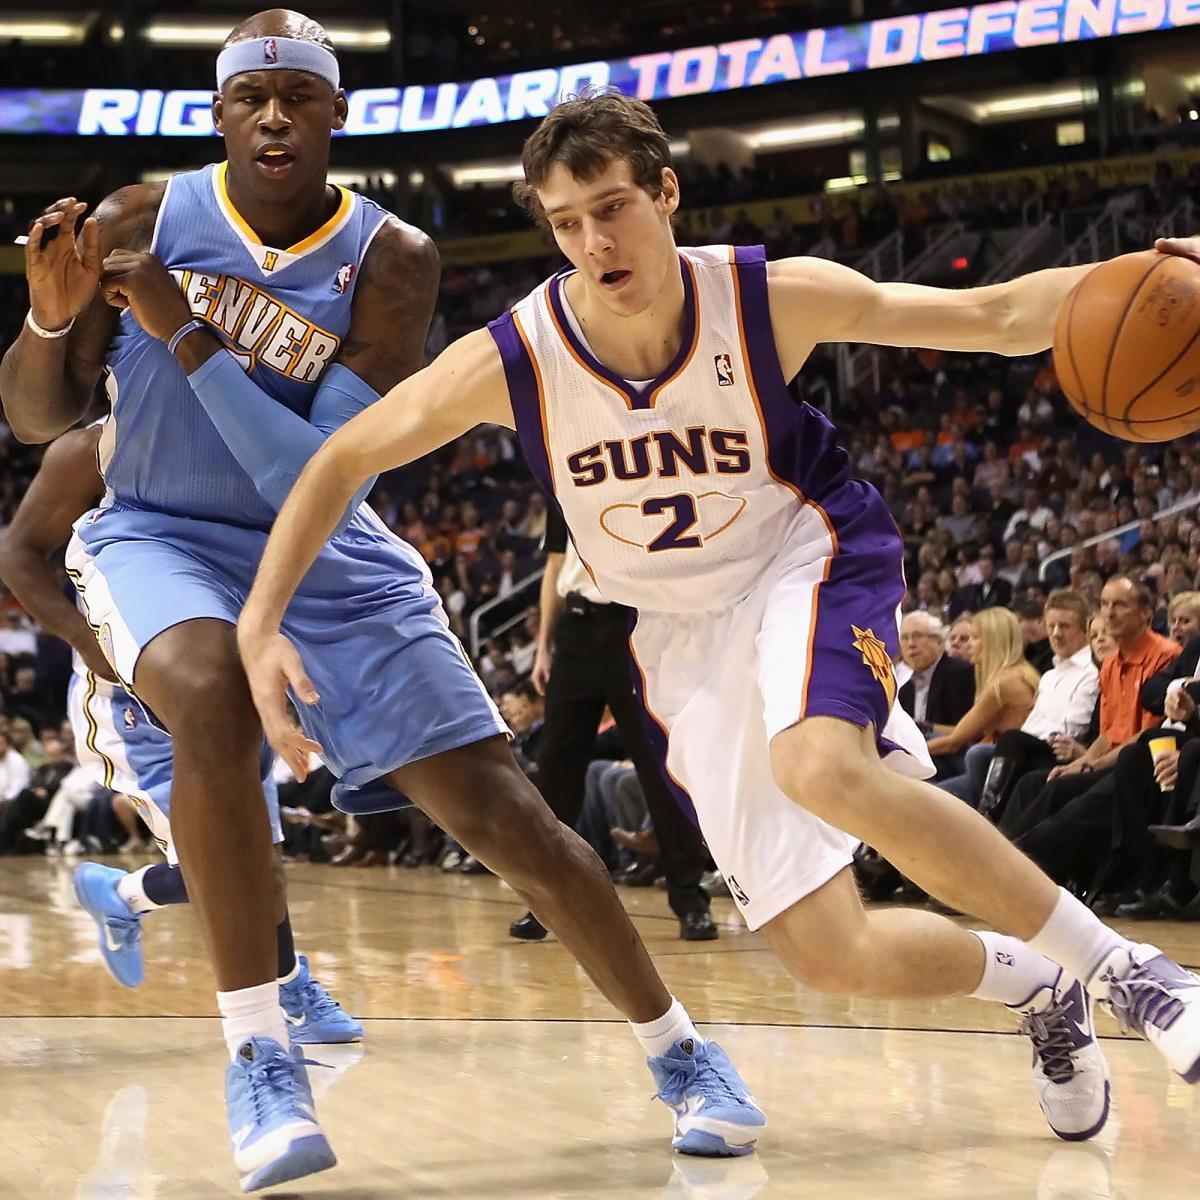 NBA Free Agents 2012: Phoenix Suns Sign Goran Dragic To 4